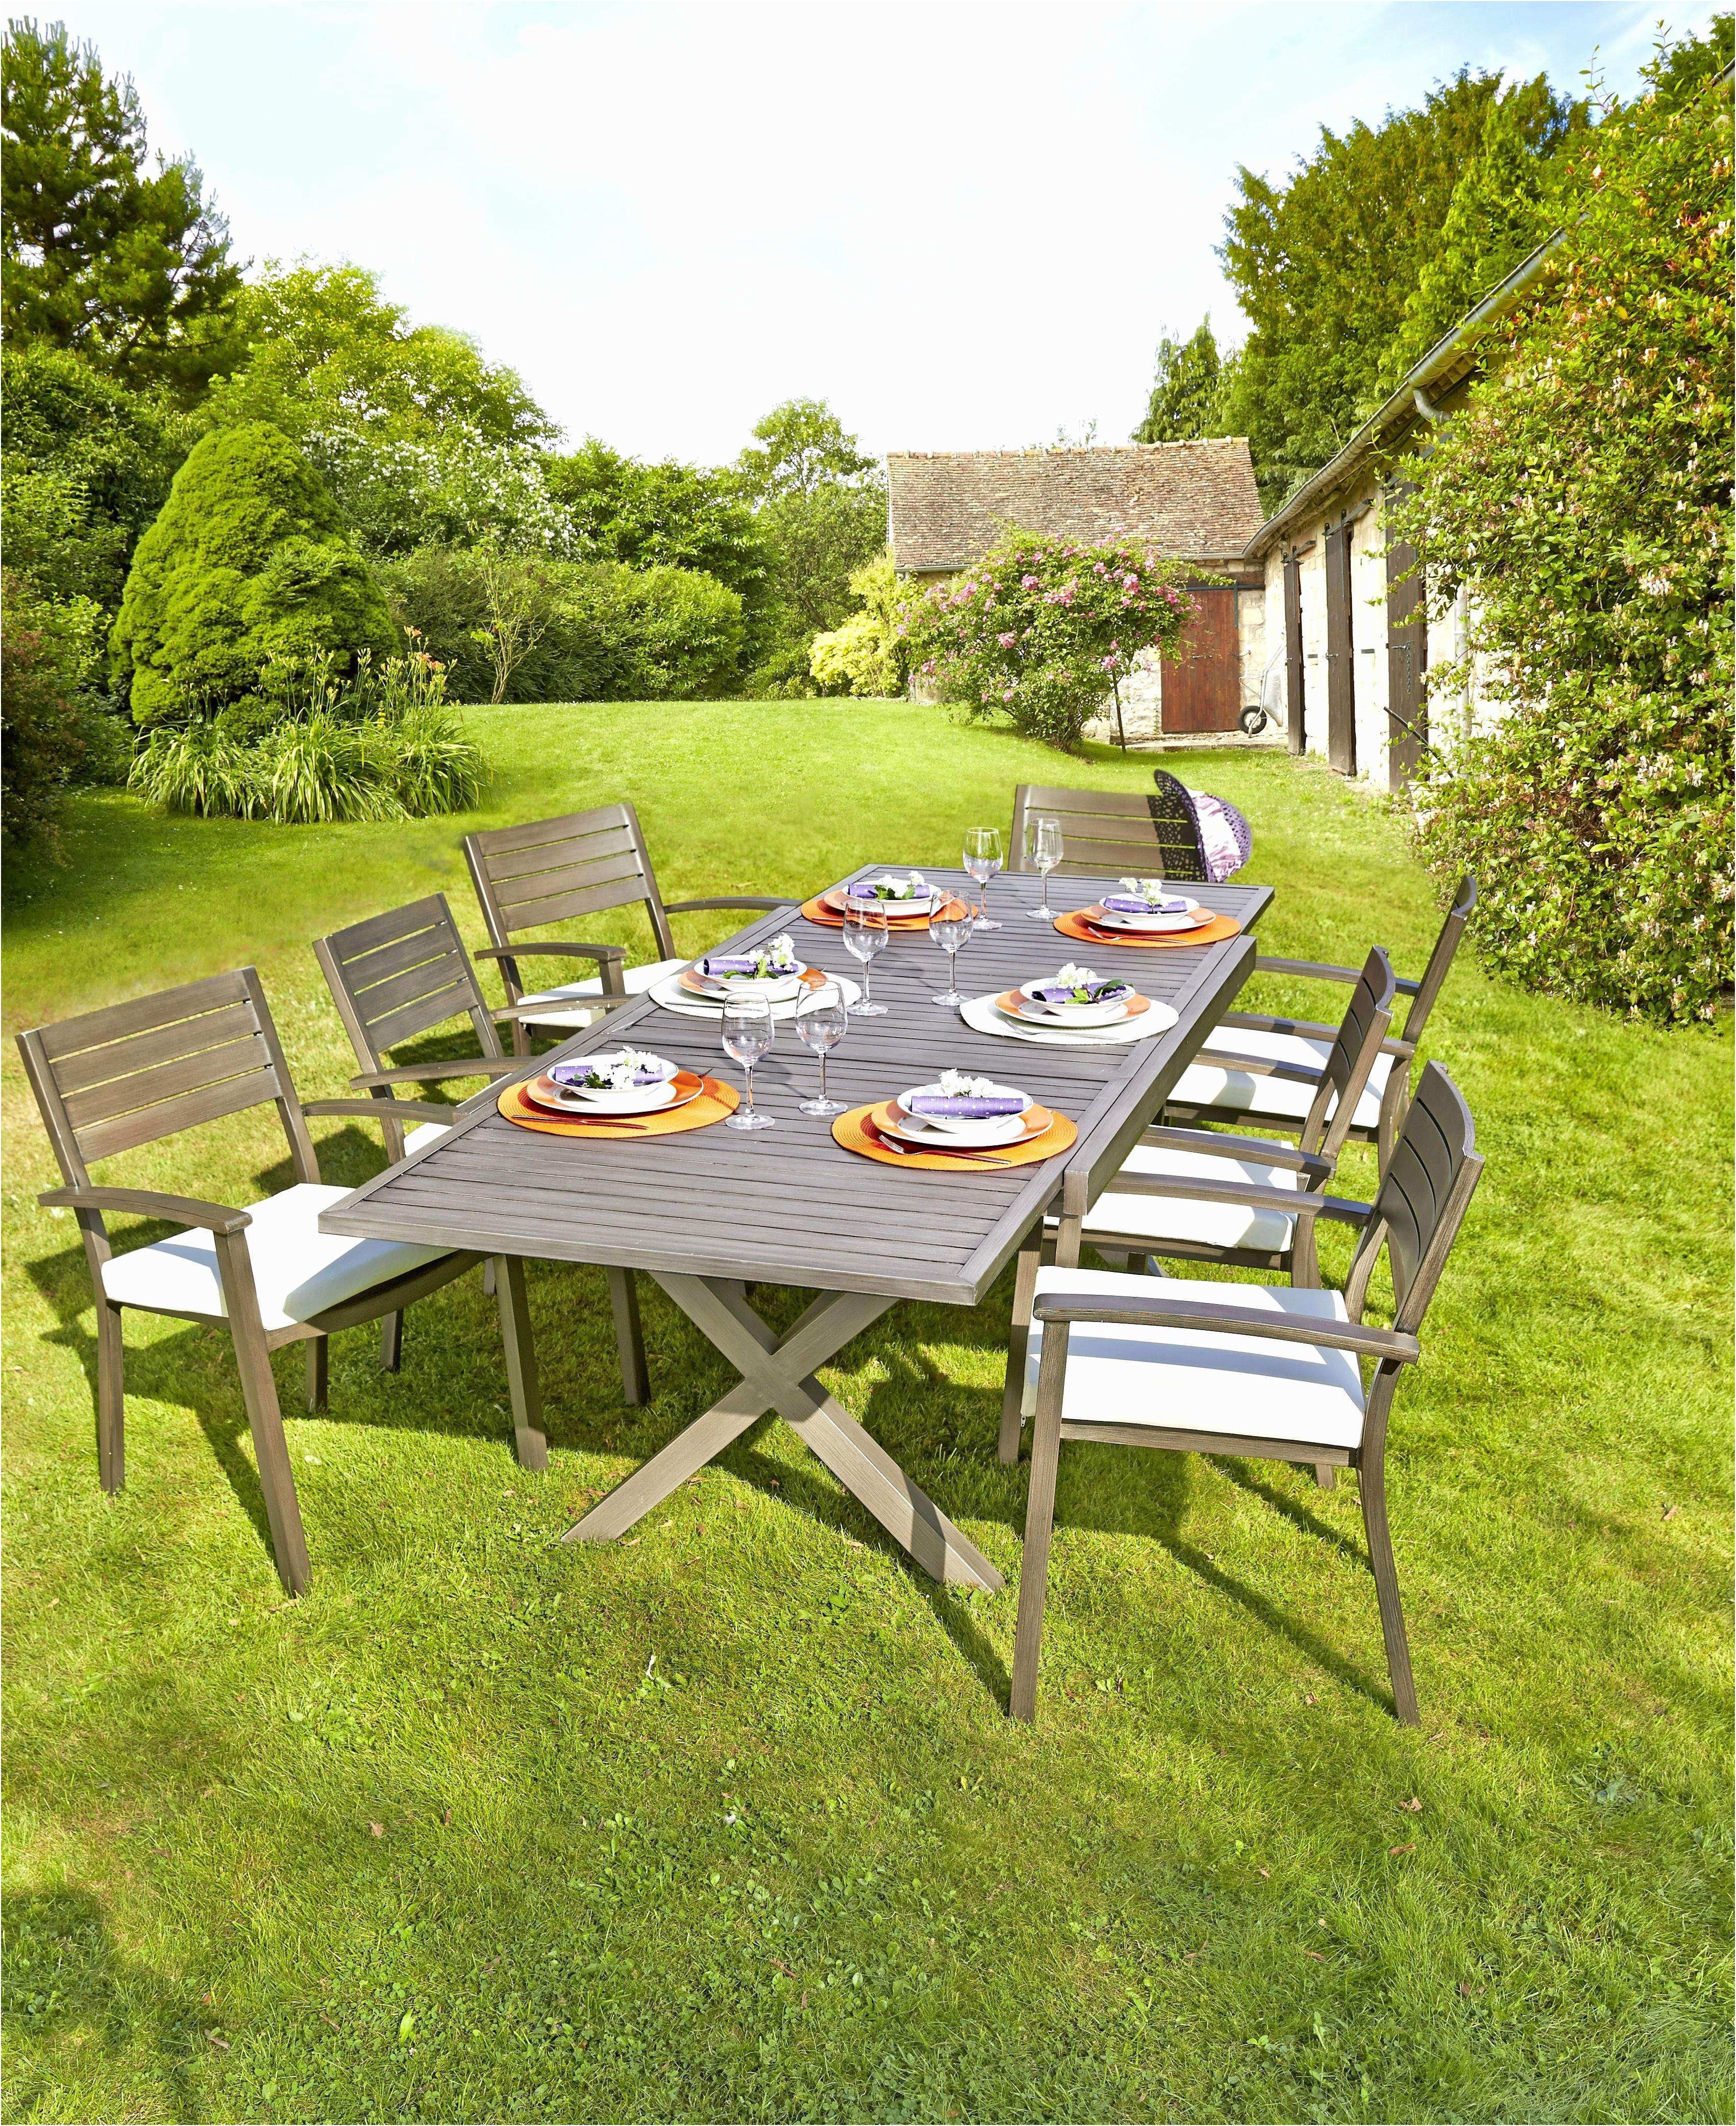 11 Sympathique Table De Jardin Alinea Pics Outdoor Tables Outdoor Decor Outdoor Furniture